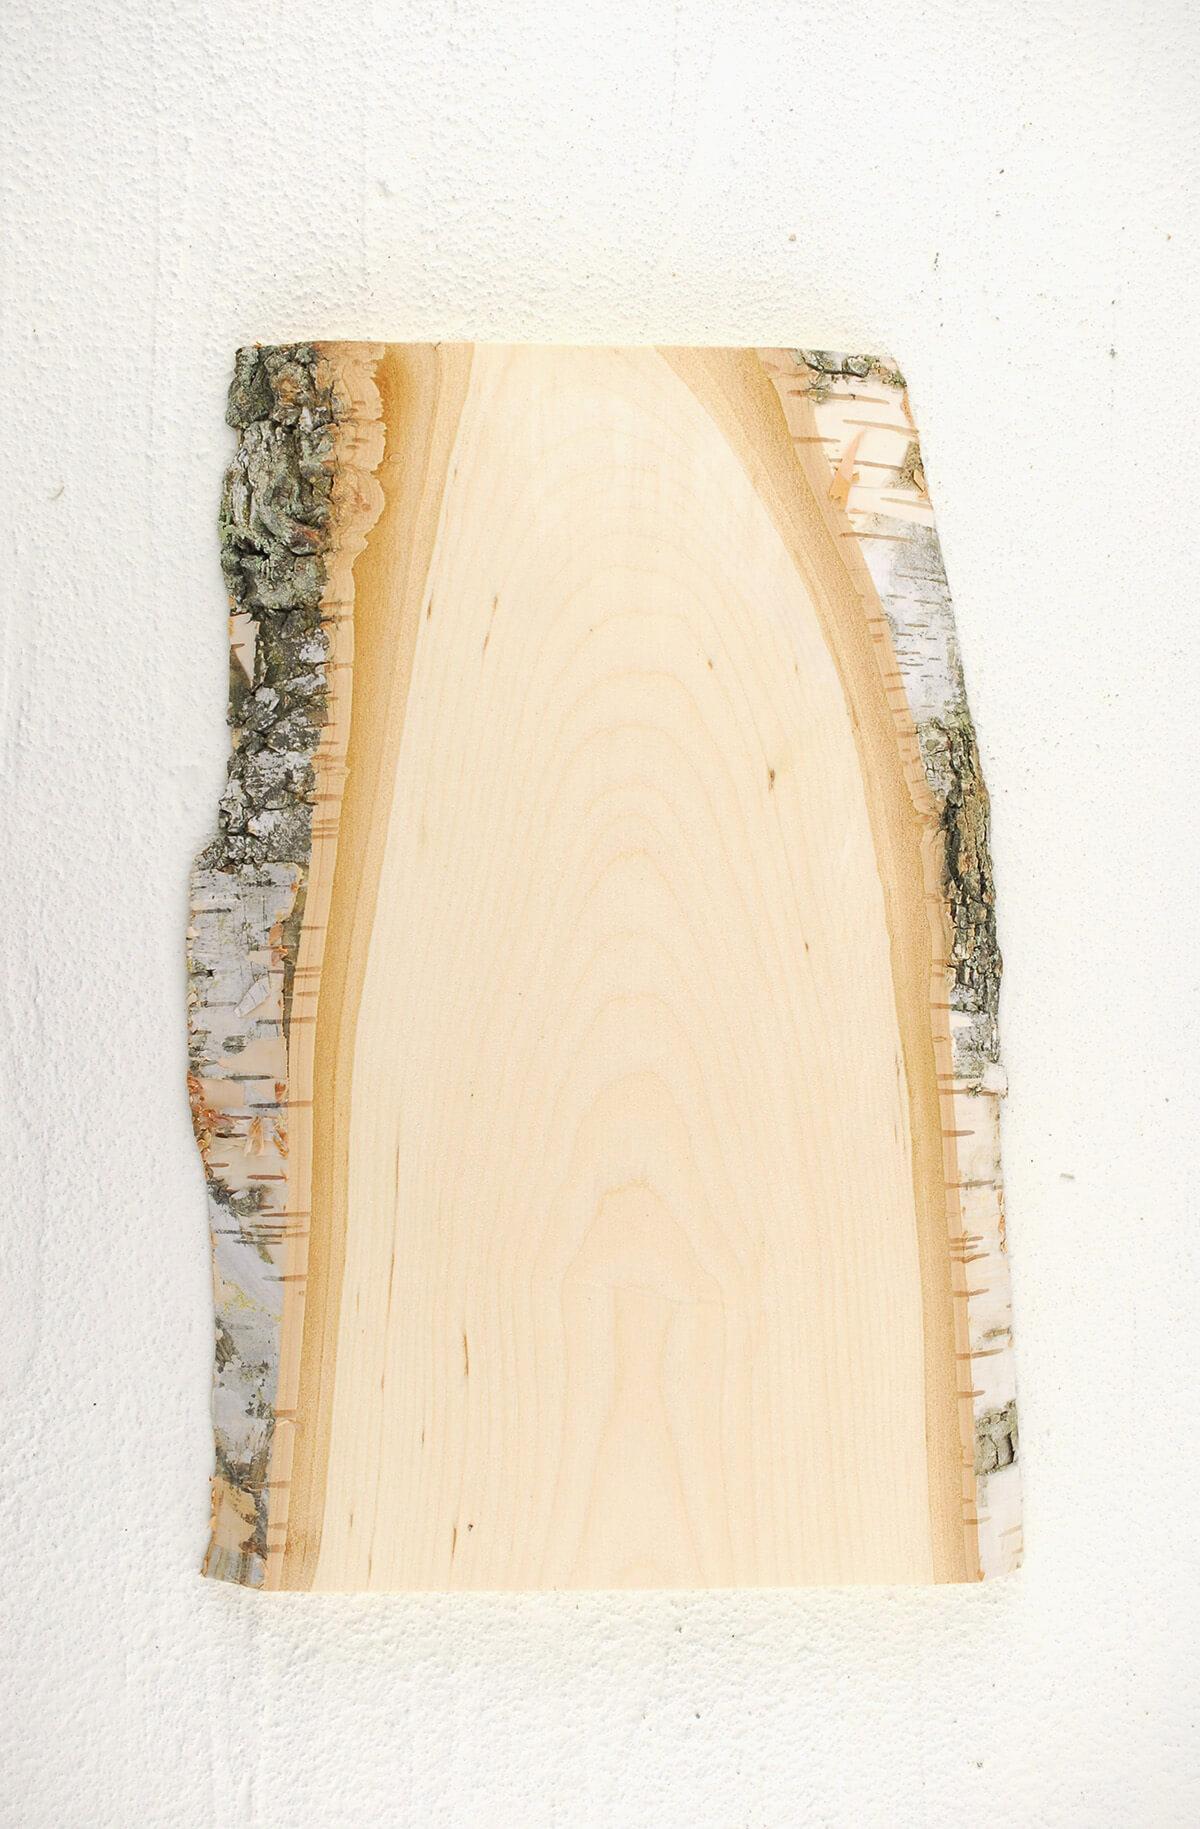 Birch plank in